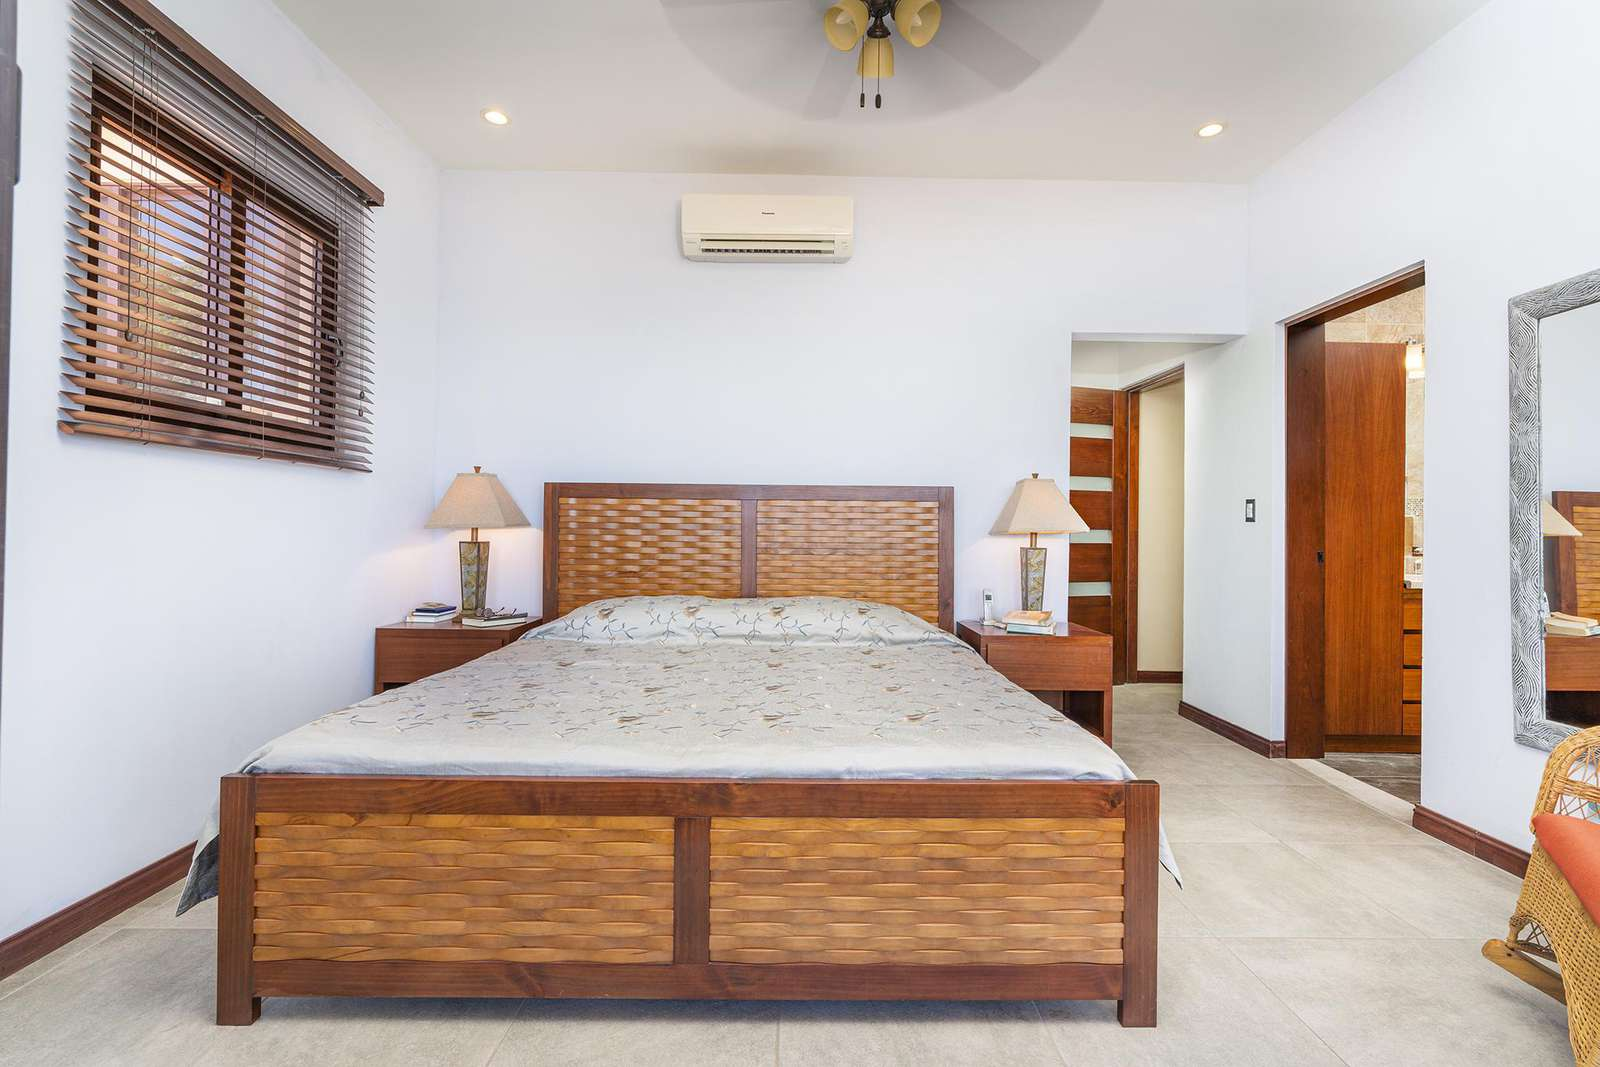 Master bedroom, king bed, private bathroom, private terrace, Ocean views